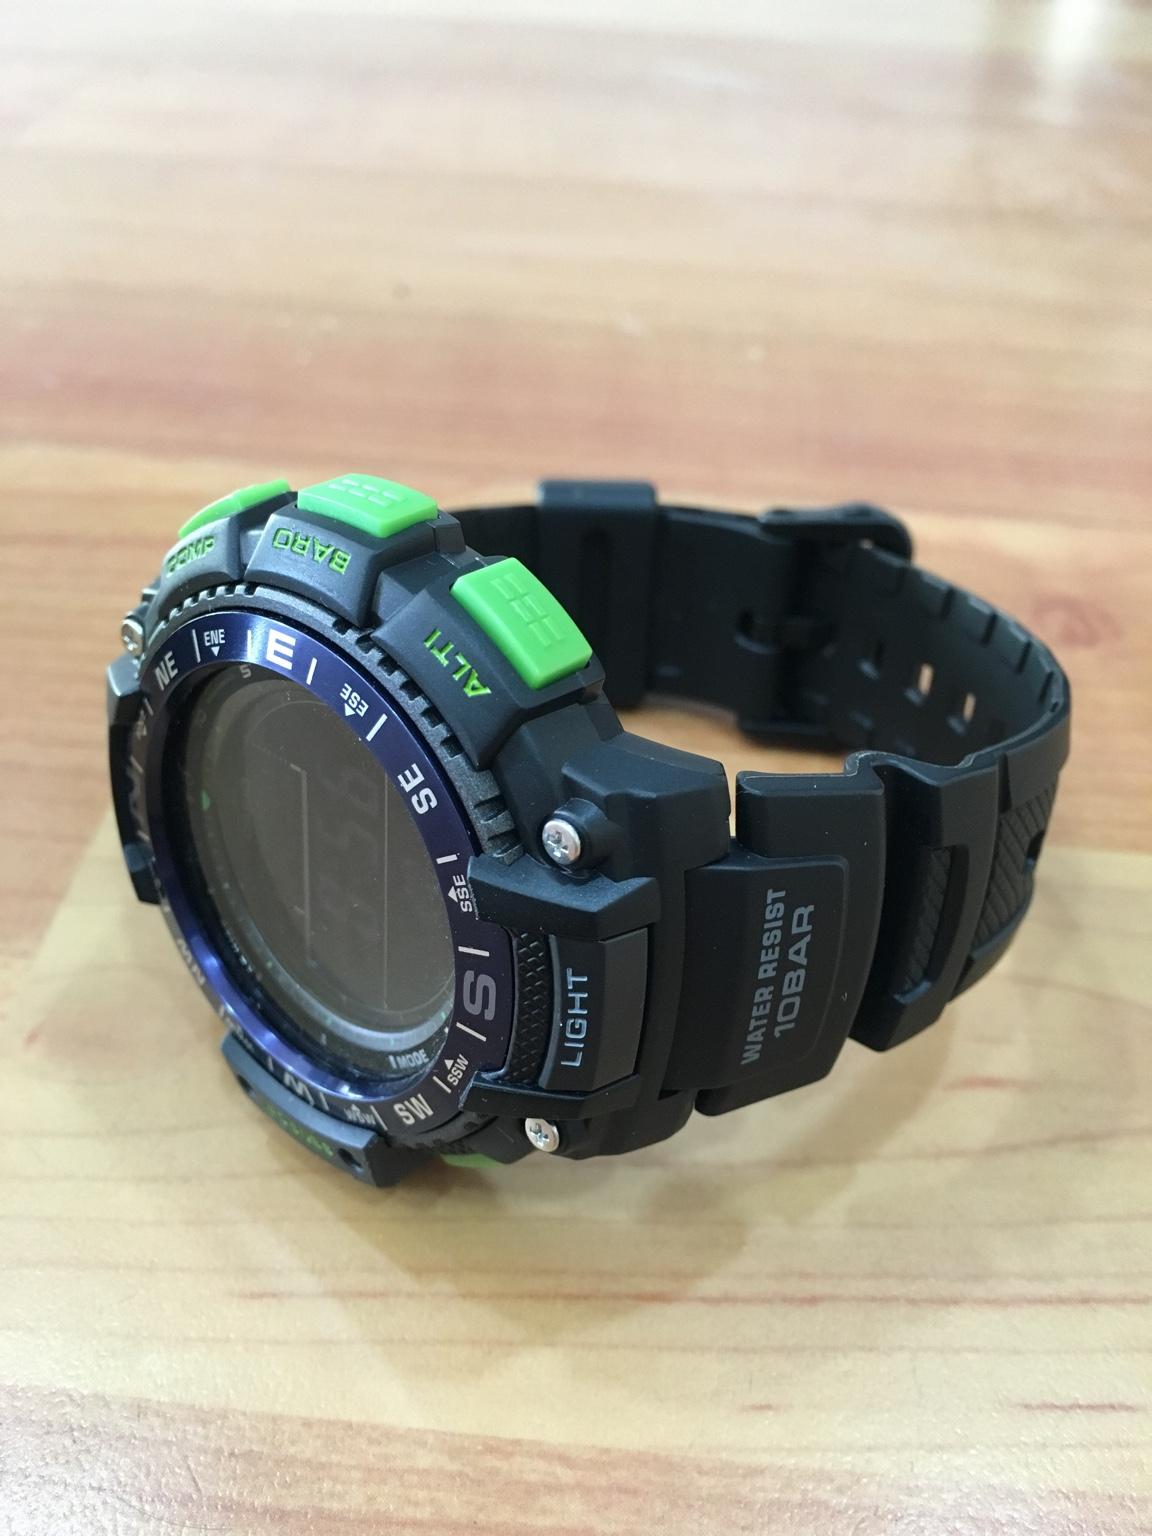 Trek 2ber Relojes Foro Casio 1000 De Vendo Pro Sgw Compraventa 0P8knwOX